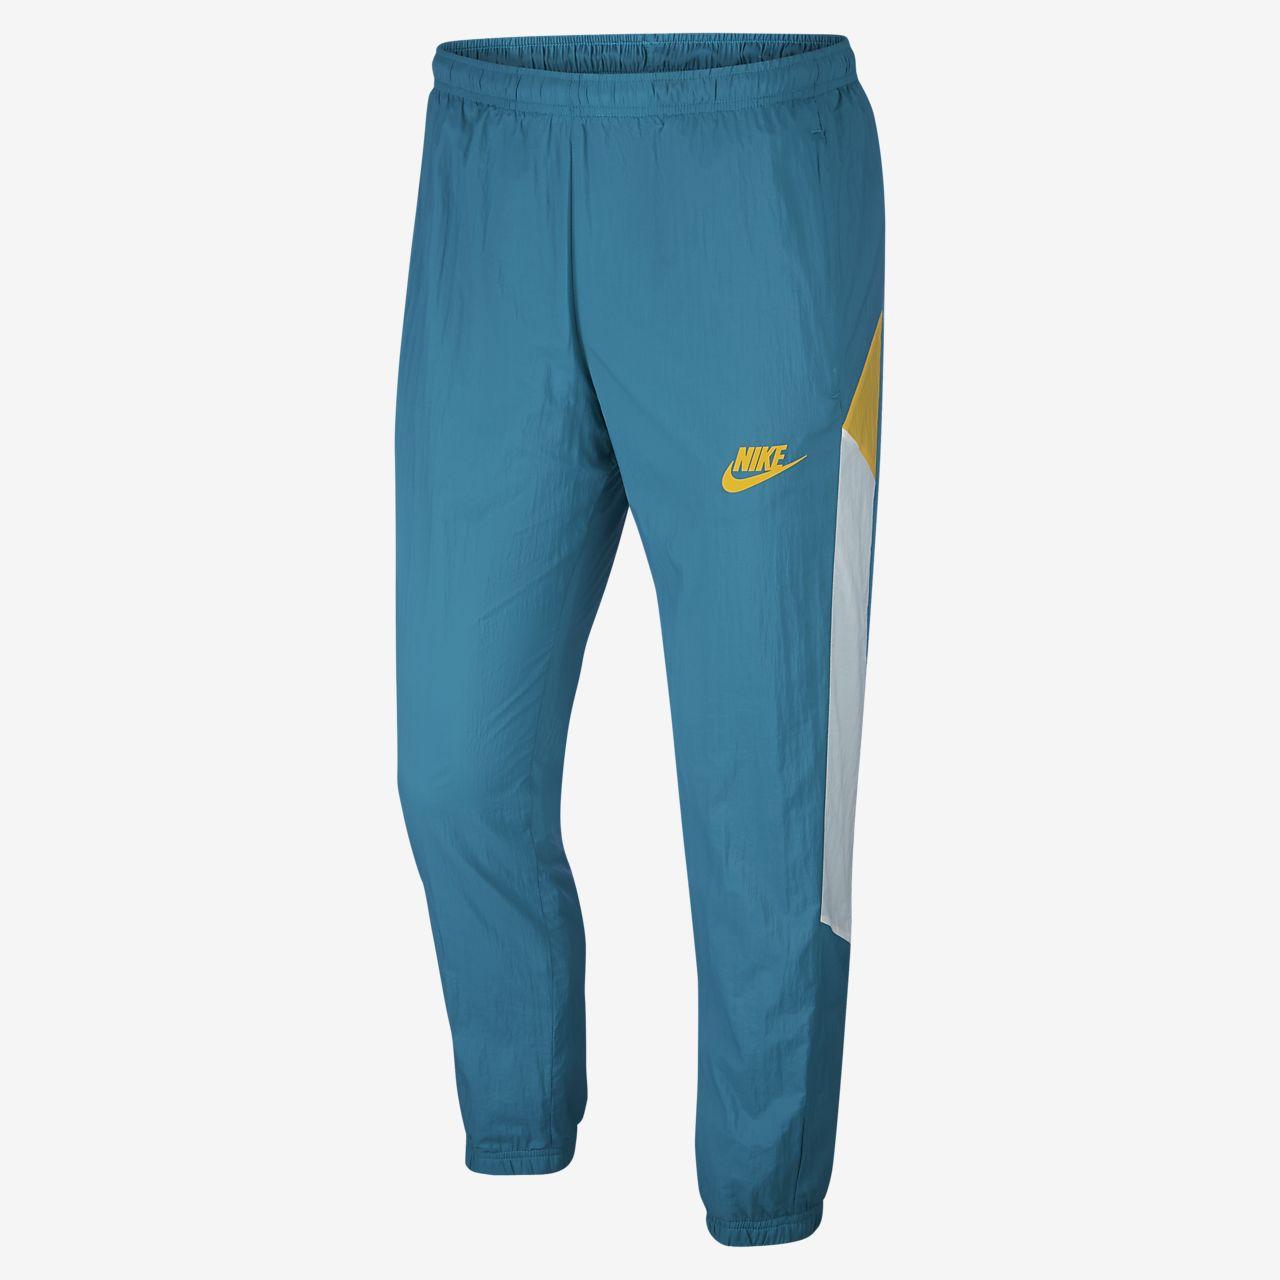 Nike Sportswear Pantalons de teixit Woven - Home